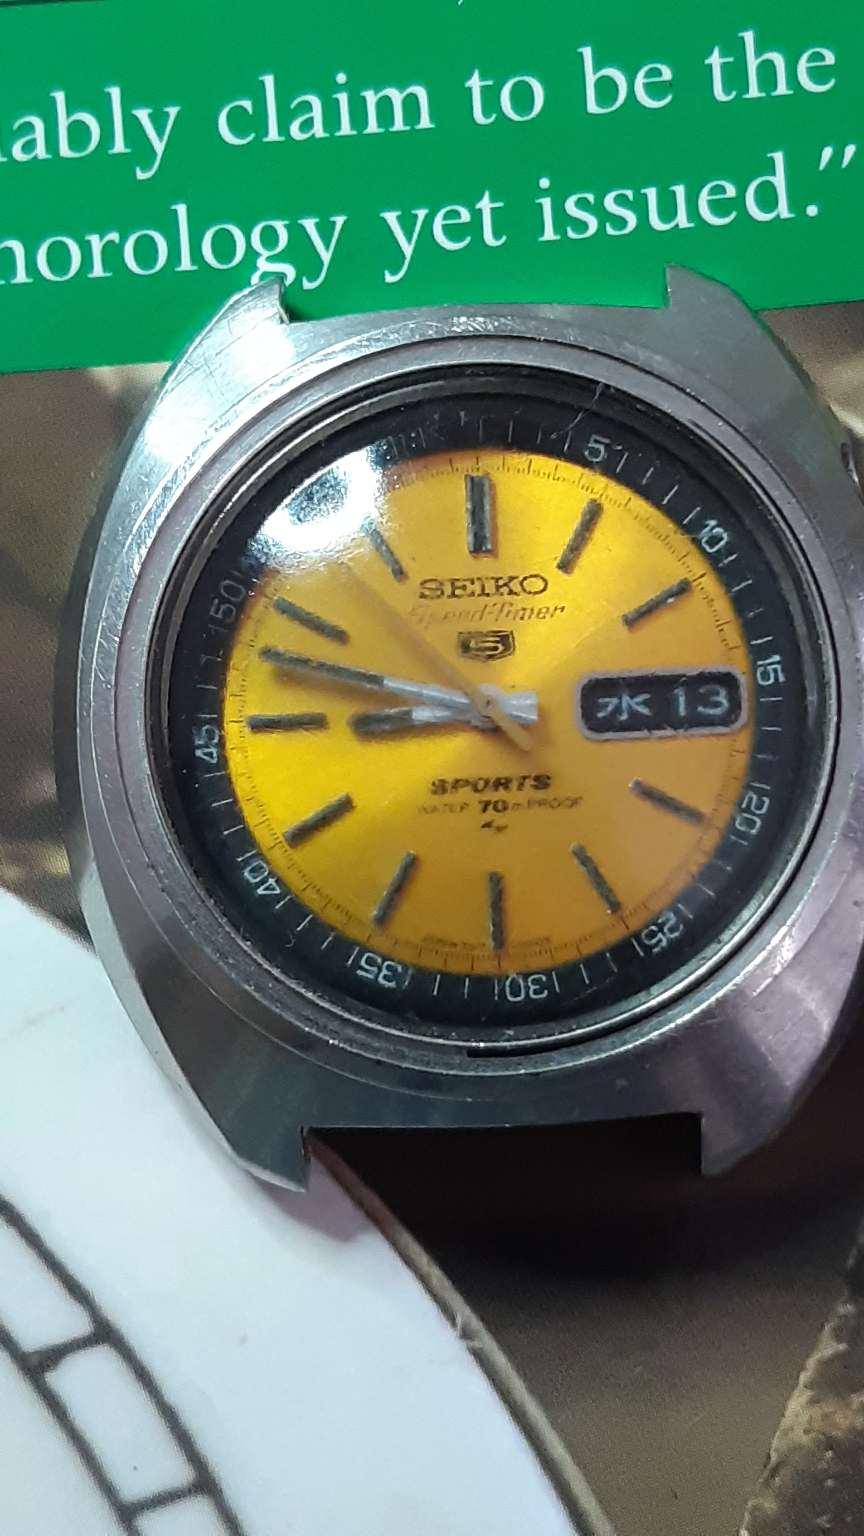 1 X GENUINE  Pusher Seiko 80600239  7017-6000 7017-6030 7017-6040 7017-6050 7017